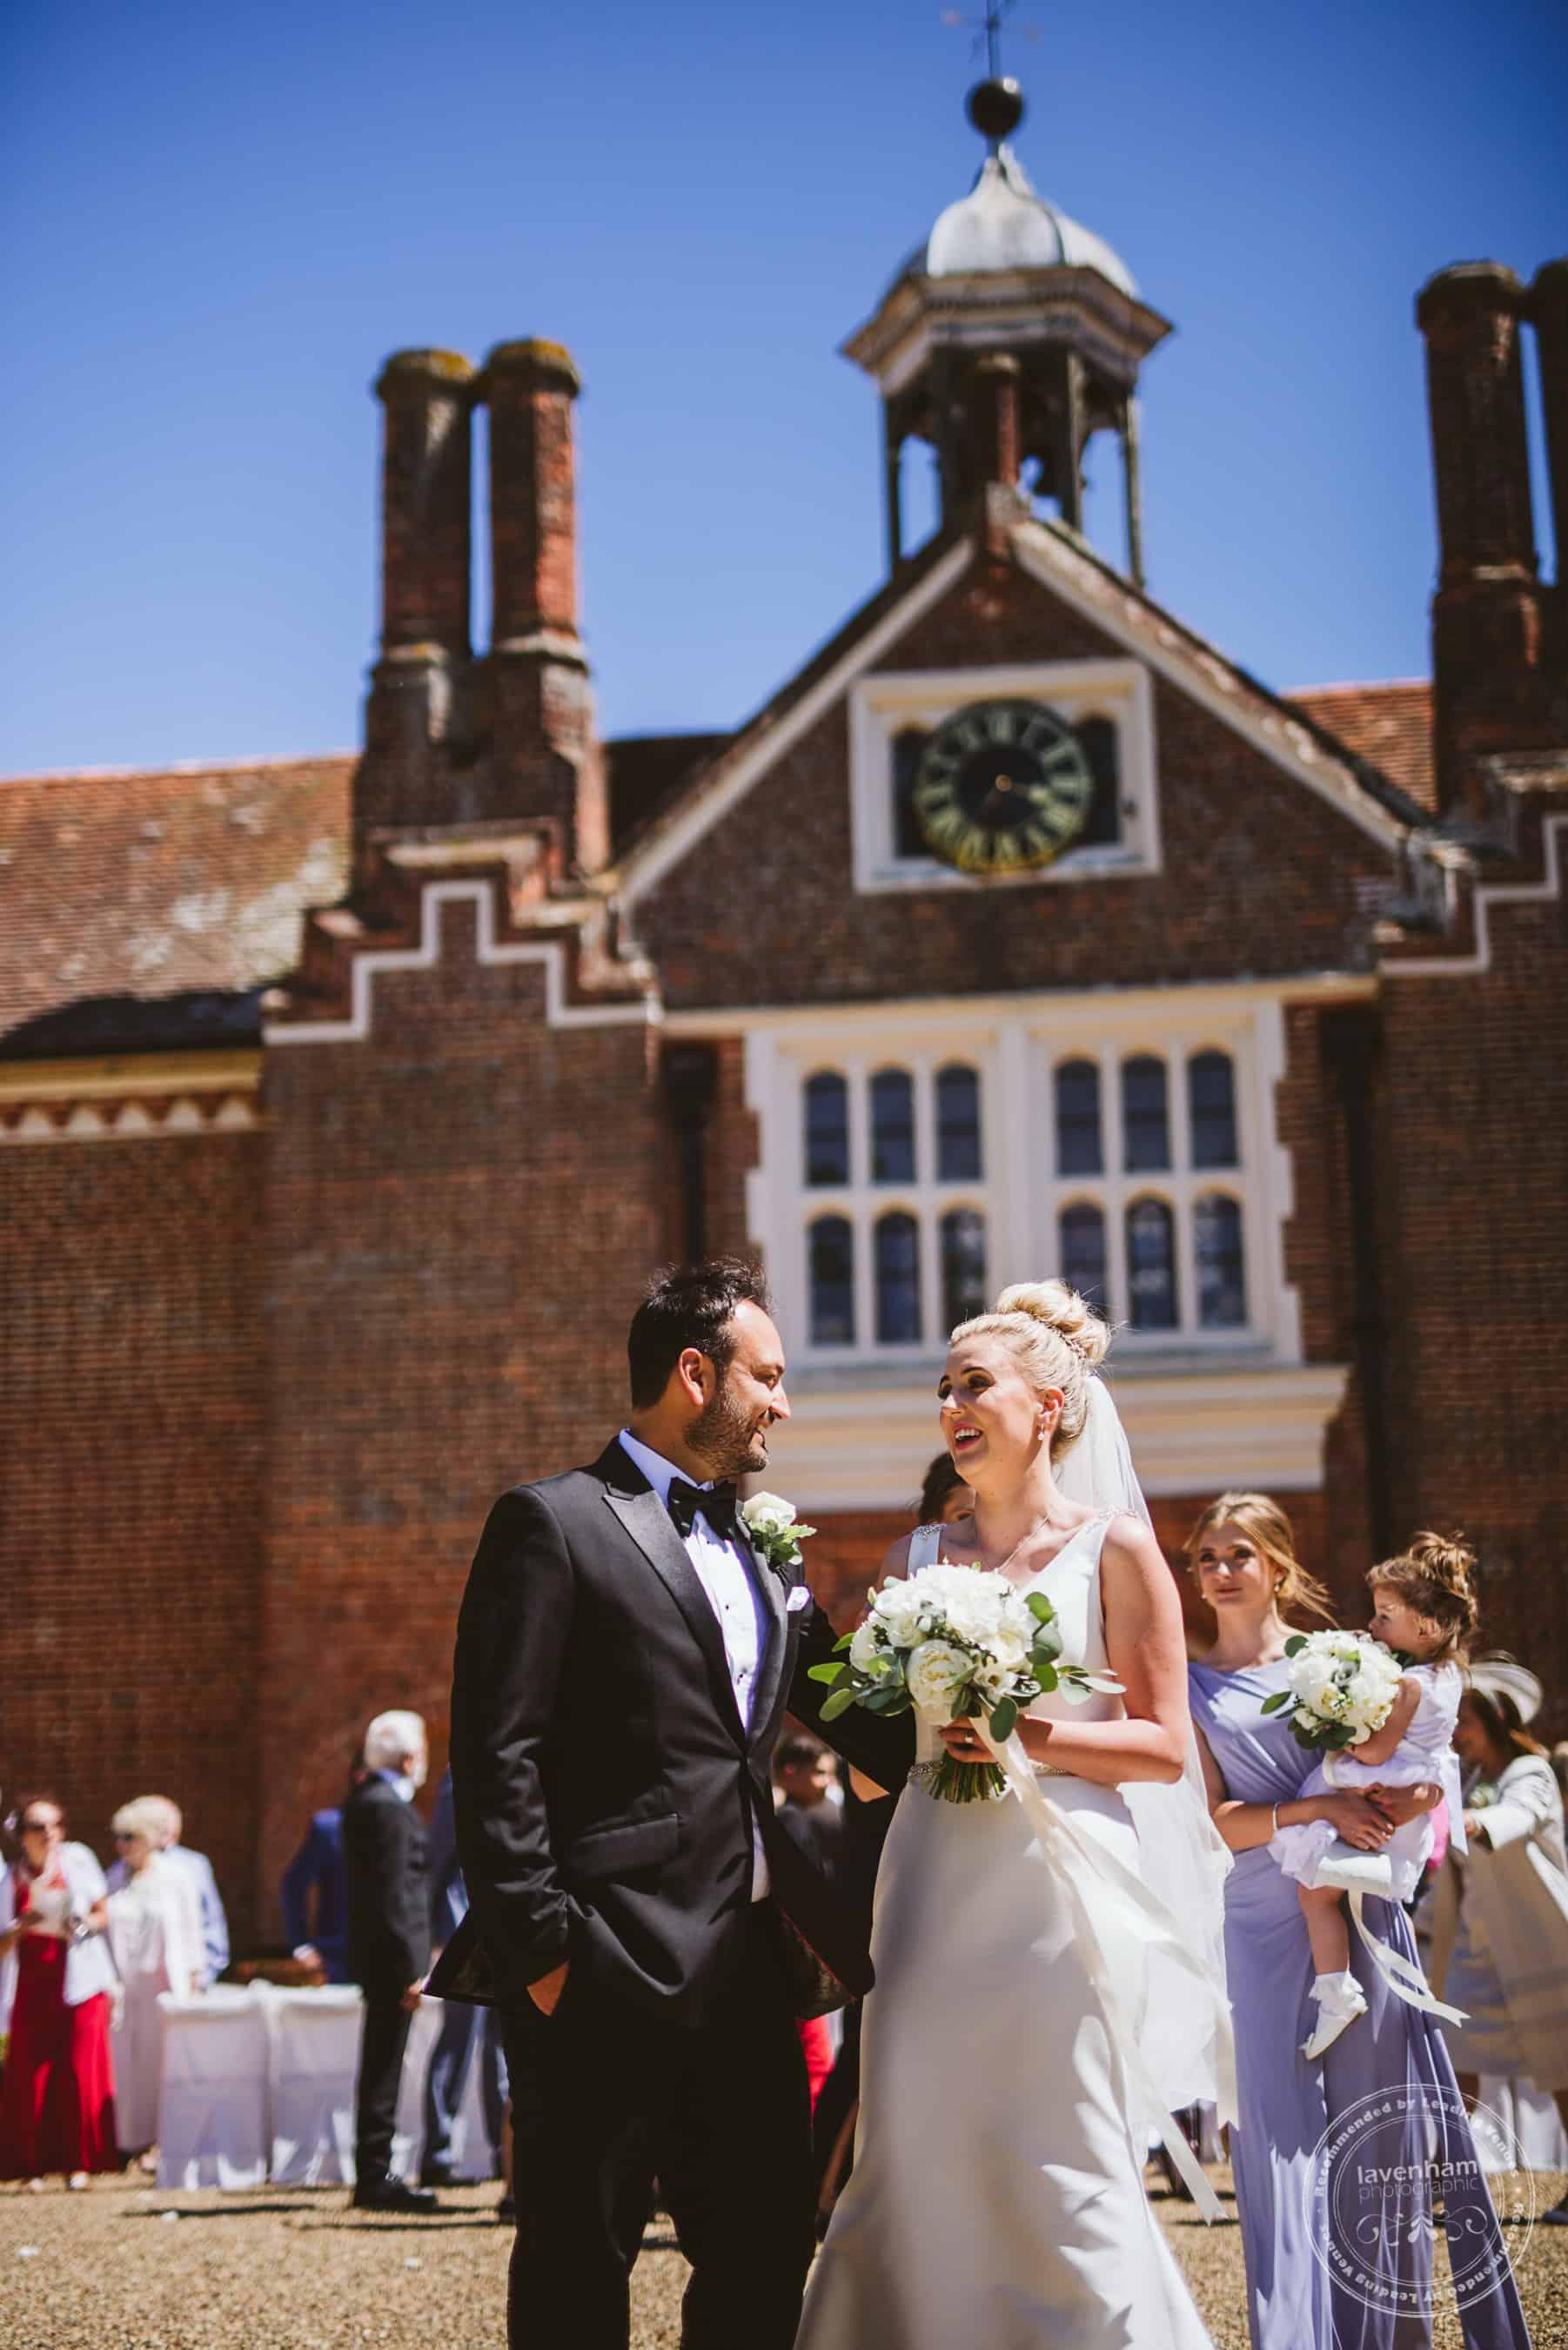 220618 Gosfield Hall Wedding Photography Lavenham Photographic 0095